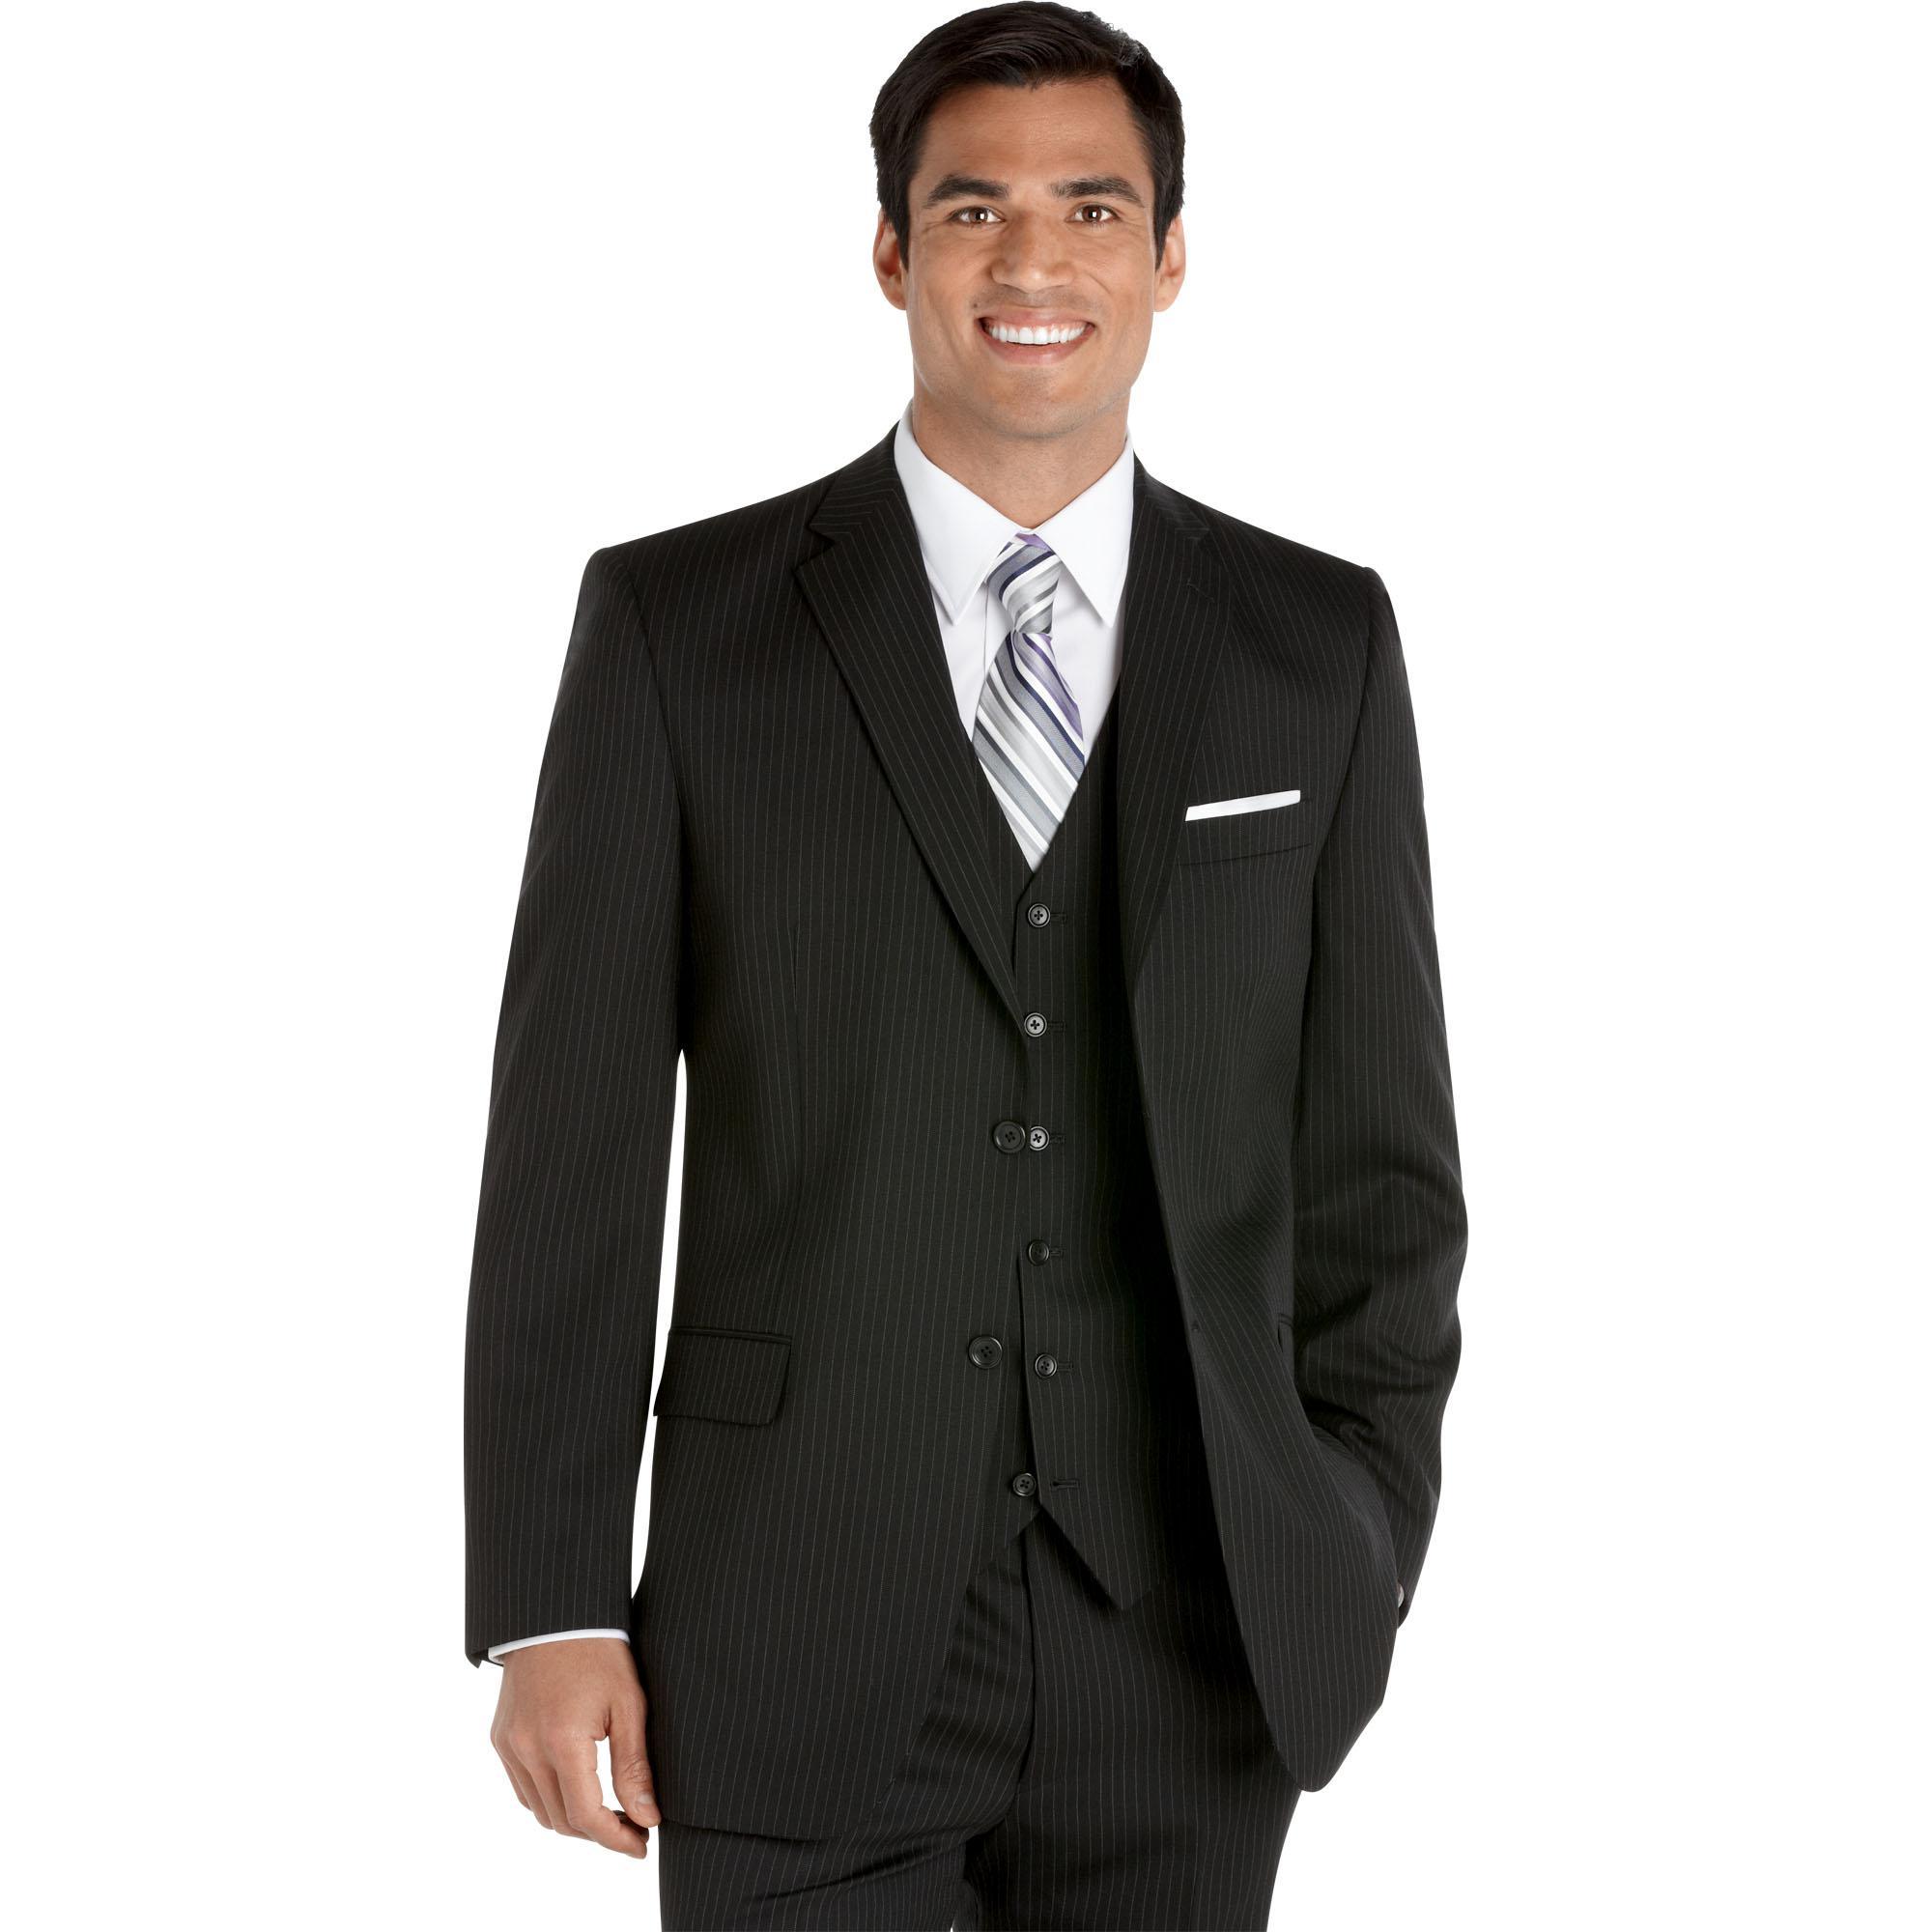 Mens Suits  Slim Fit amp Tailored Fit Suits  MampS